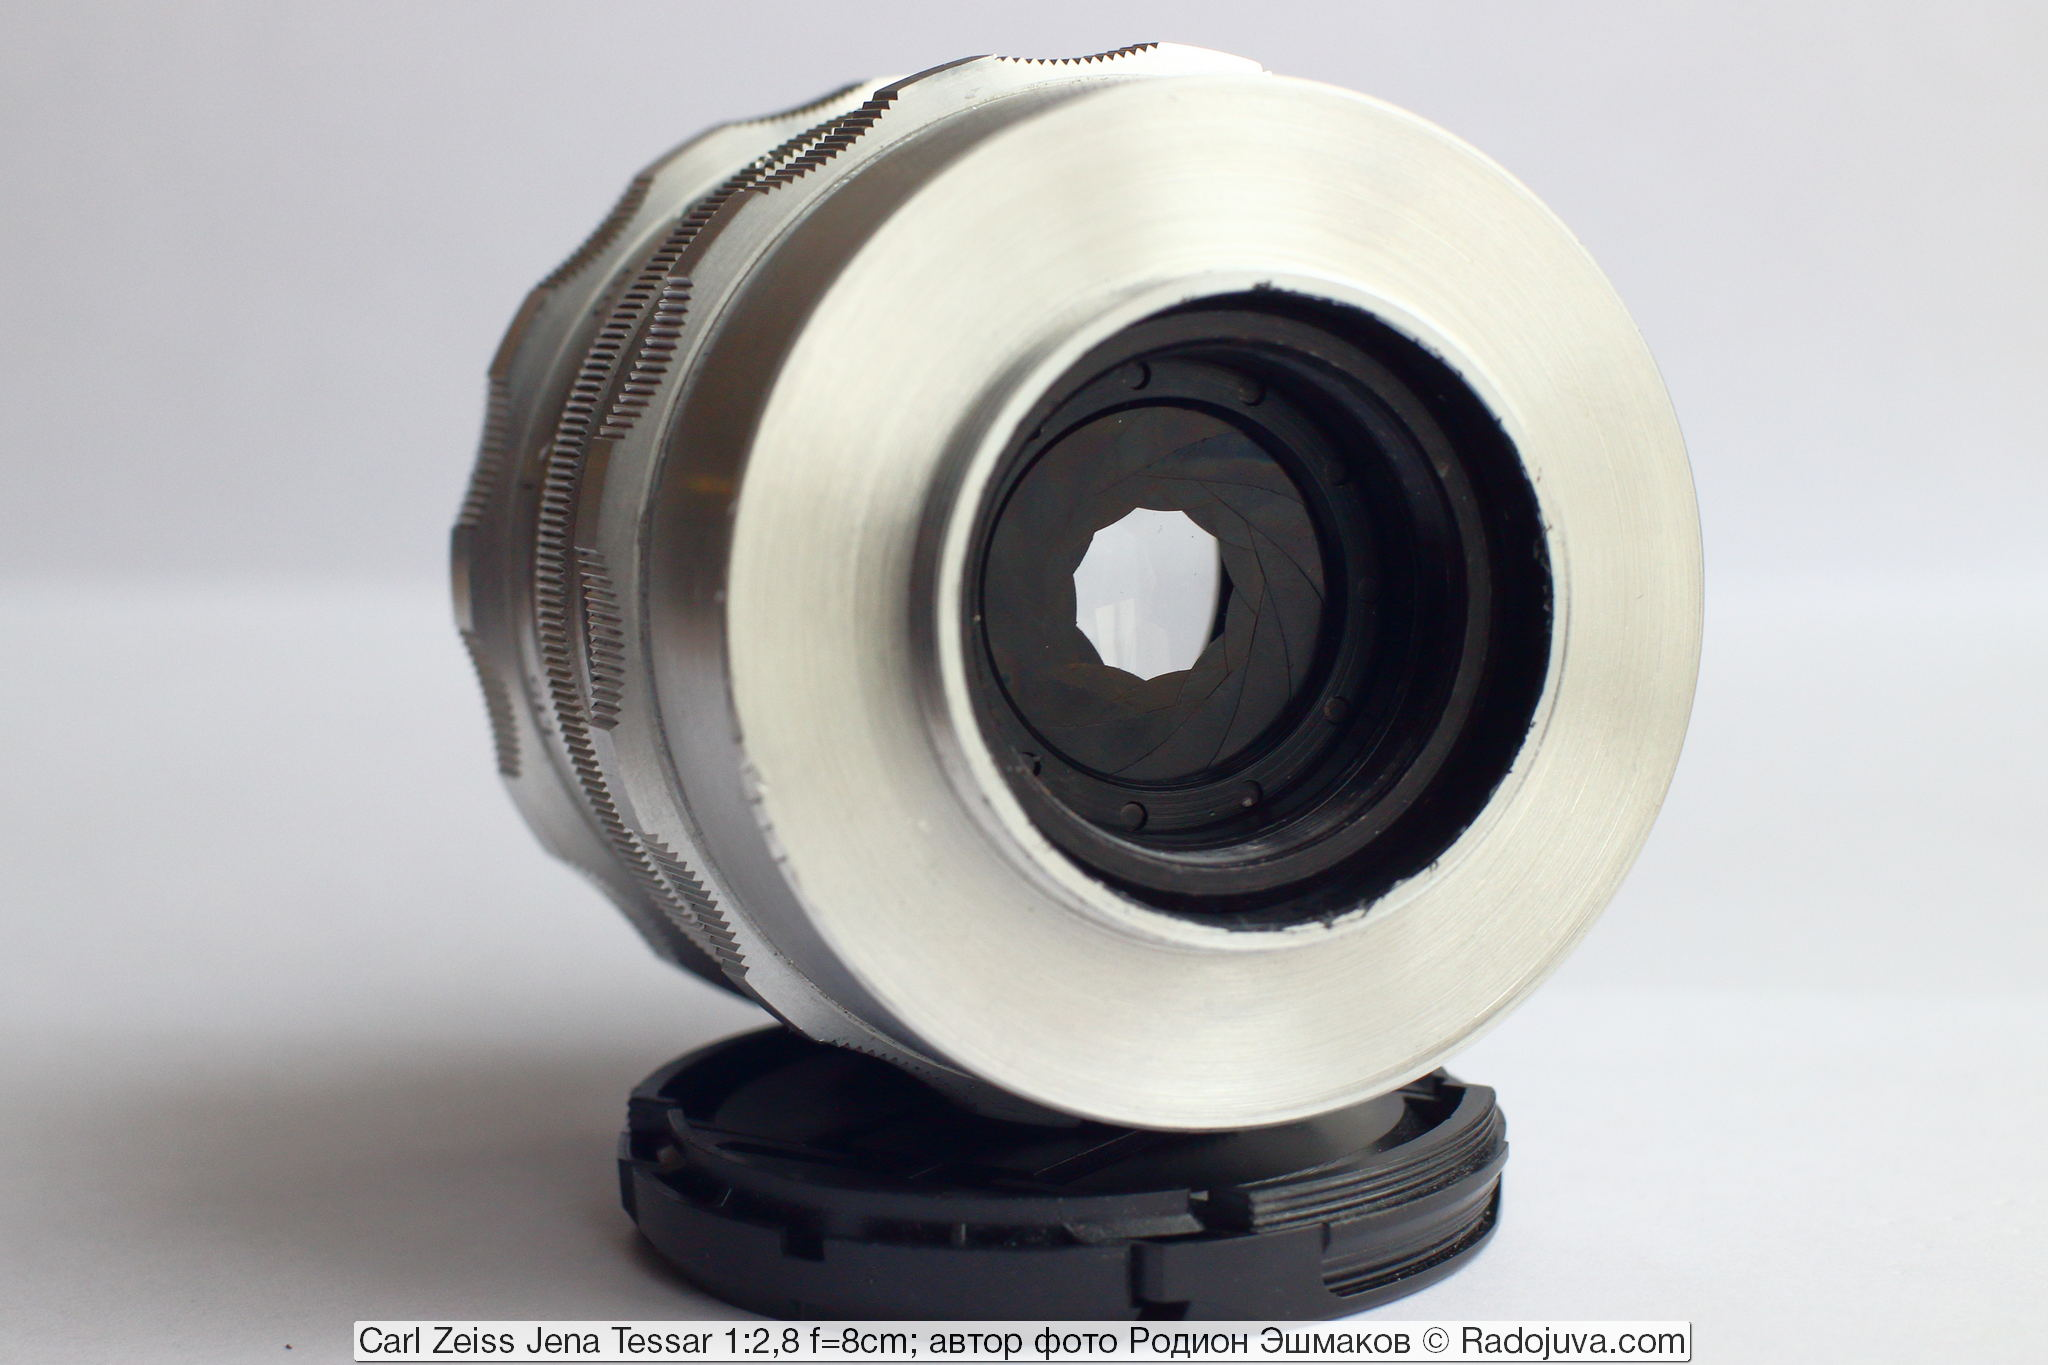 Вид на диафрагму объектива со стороны хвостовика.